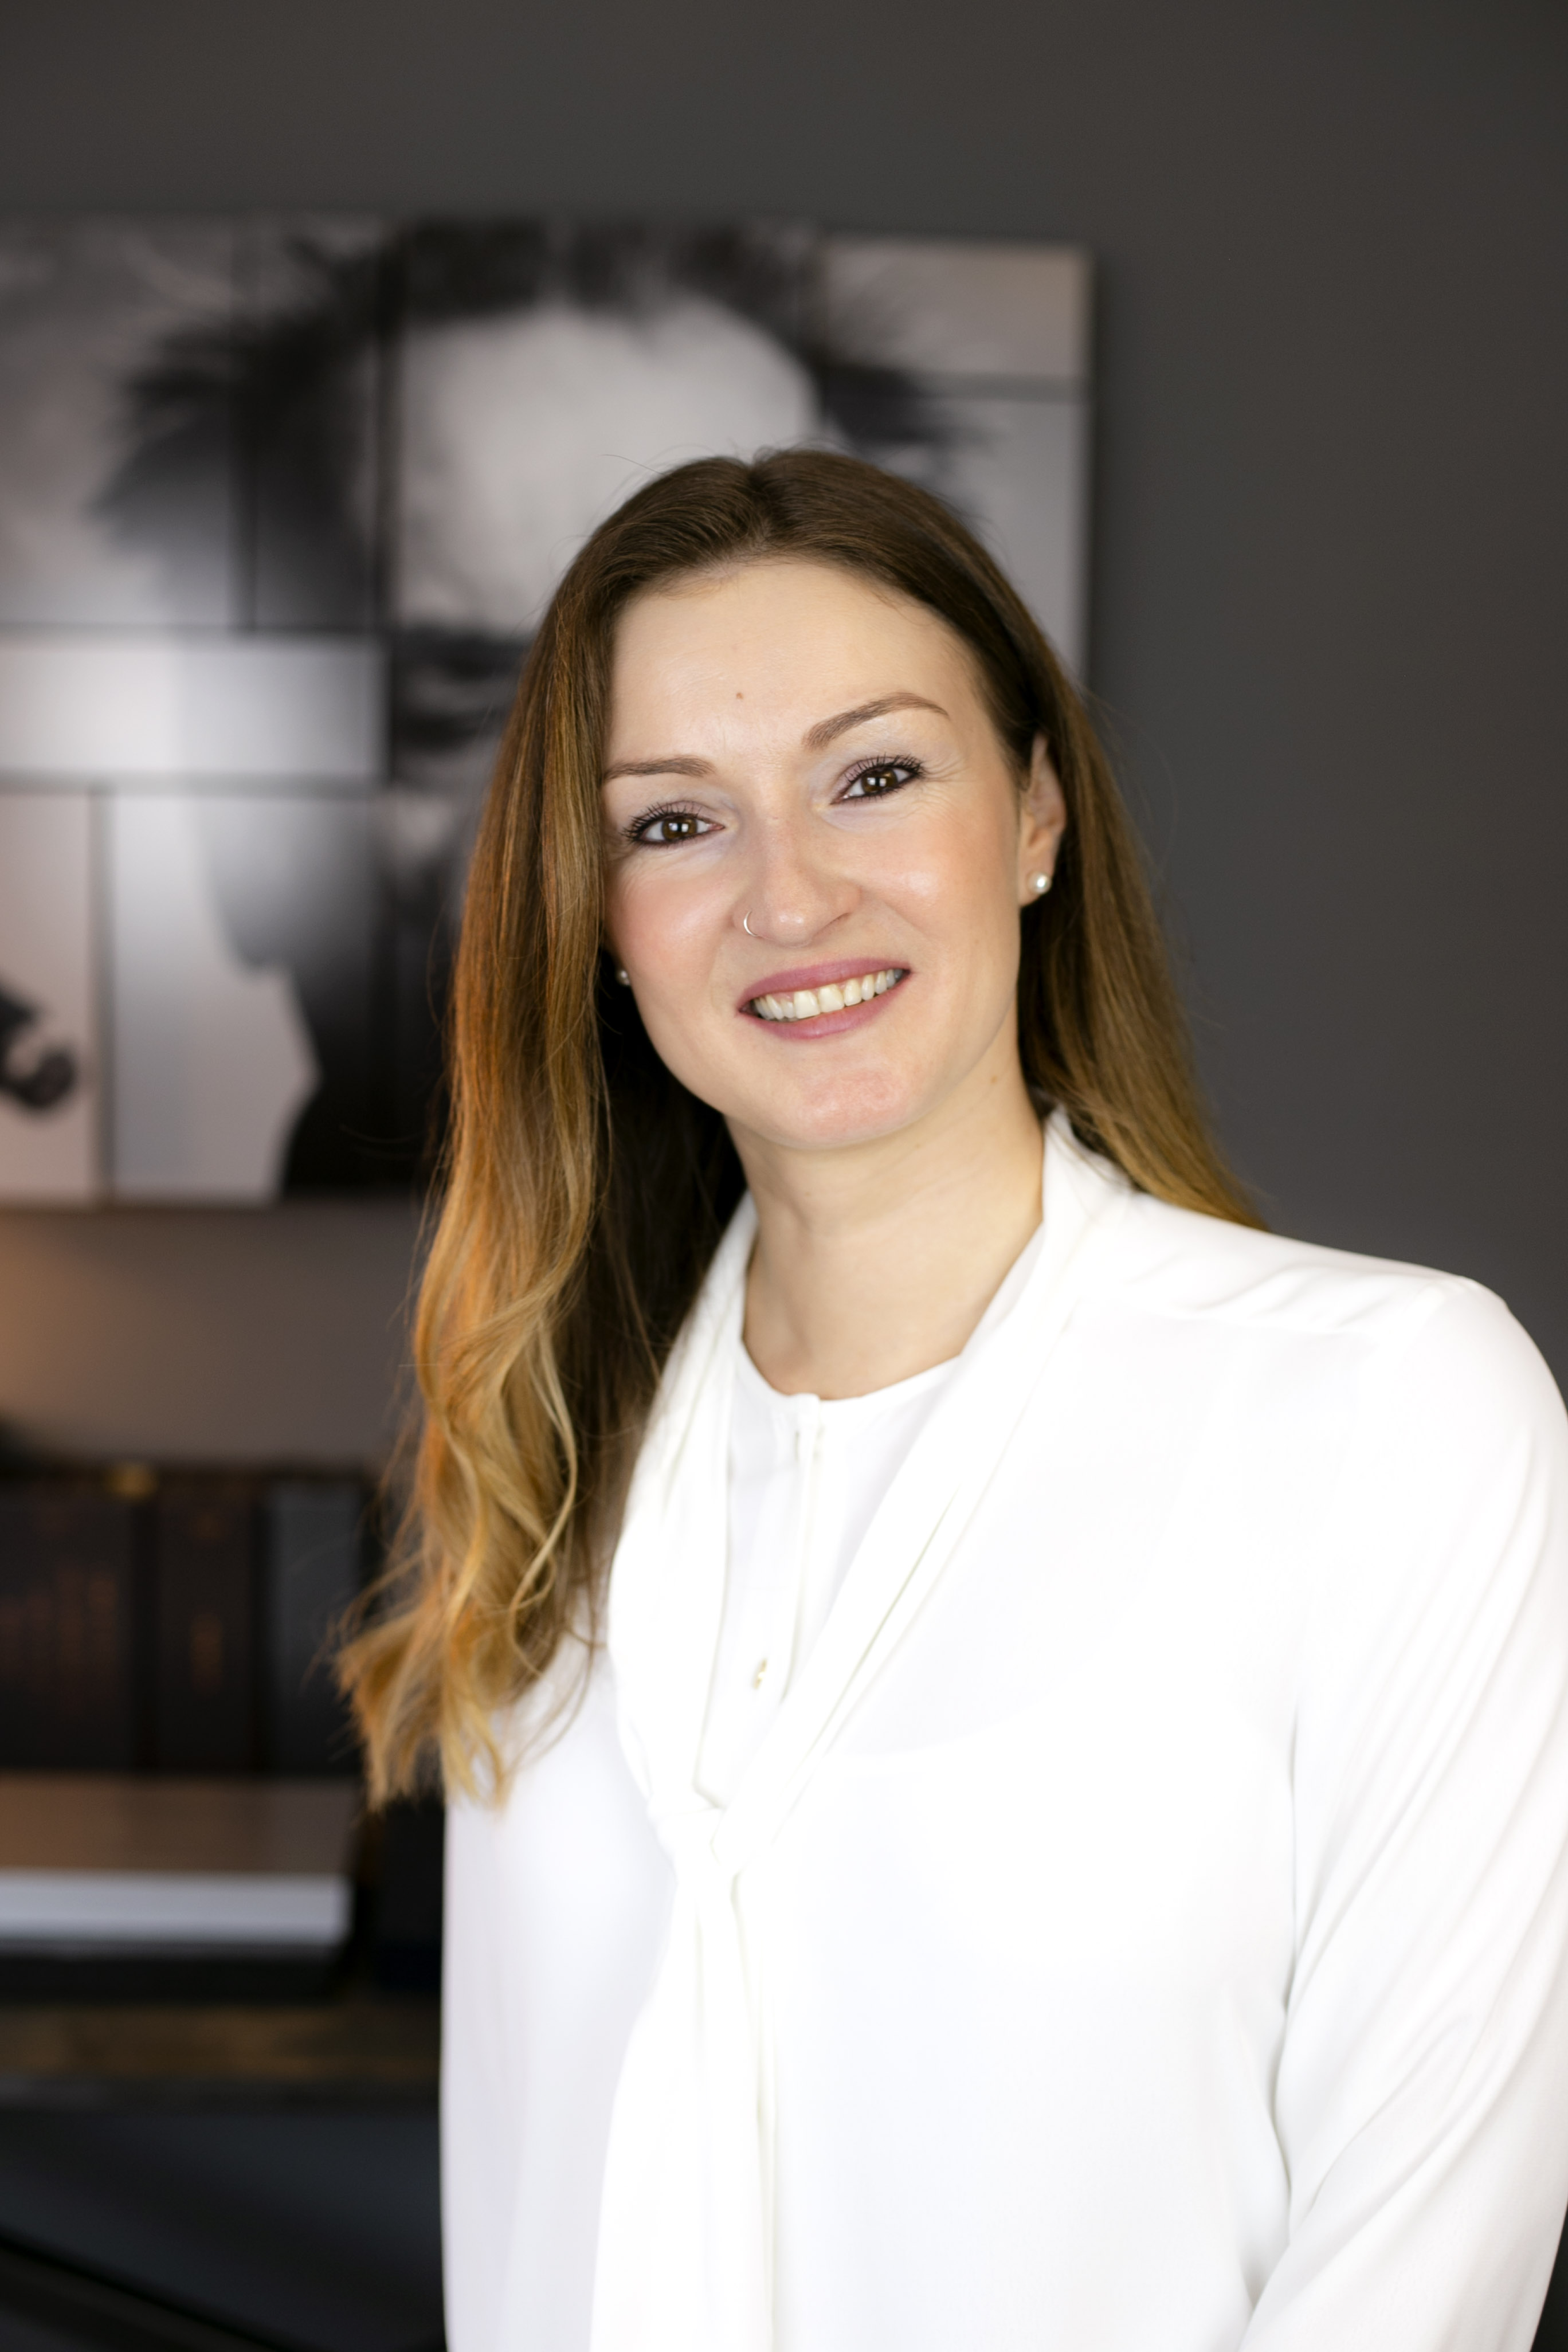 Neue Mitarbeiterin Claudia Besserdich